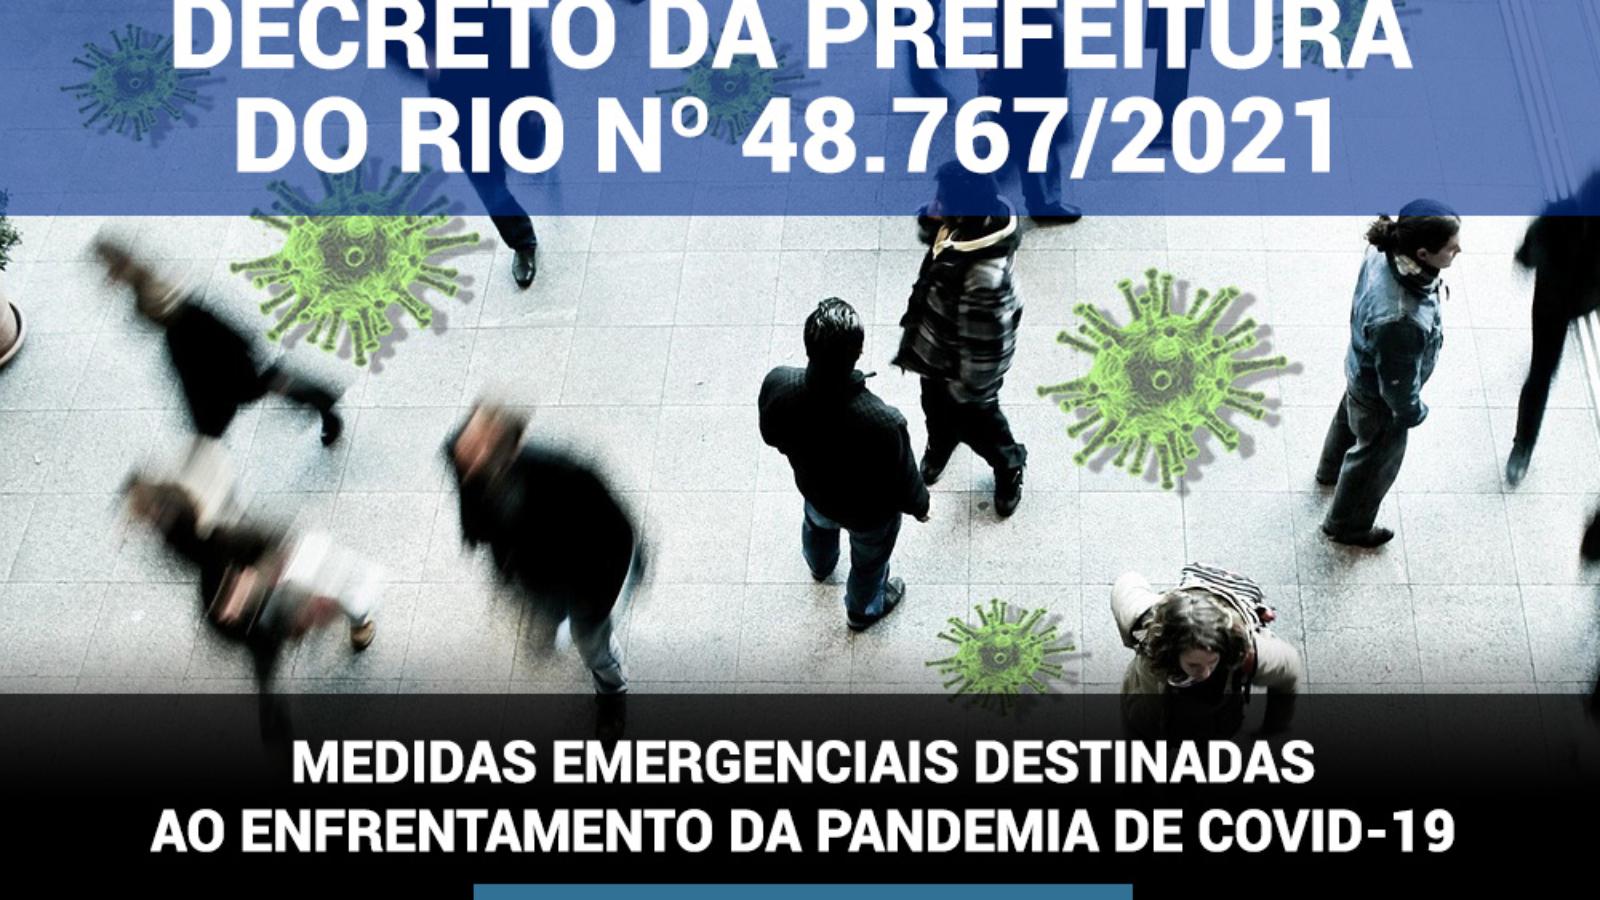 Decreto nº 48767 de 22/04/2021